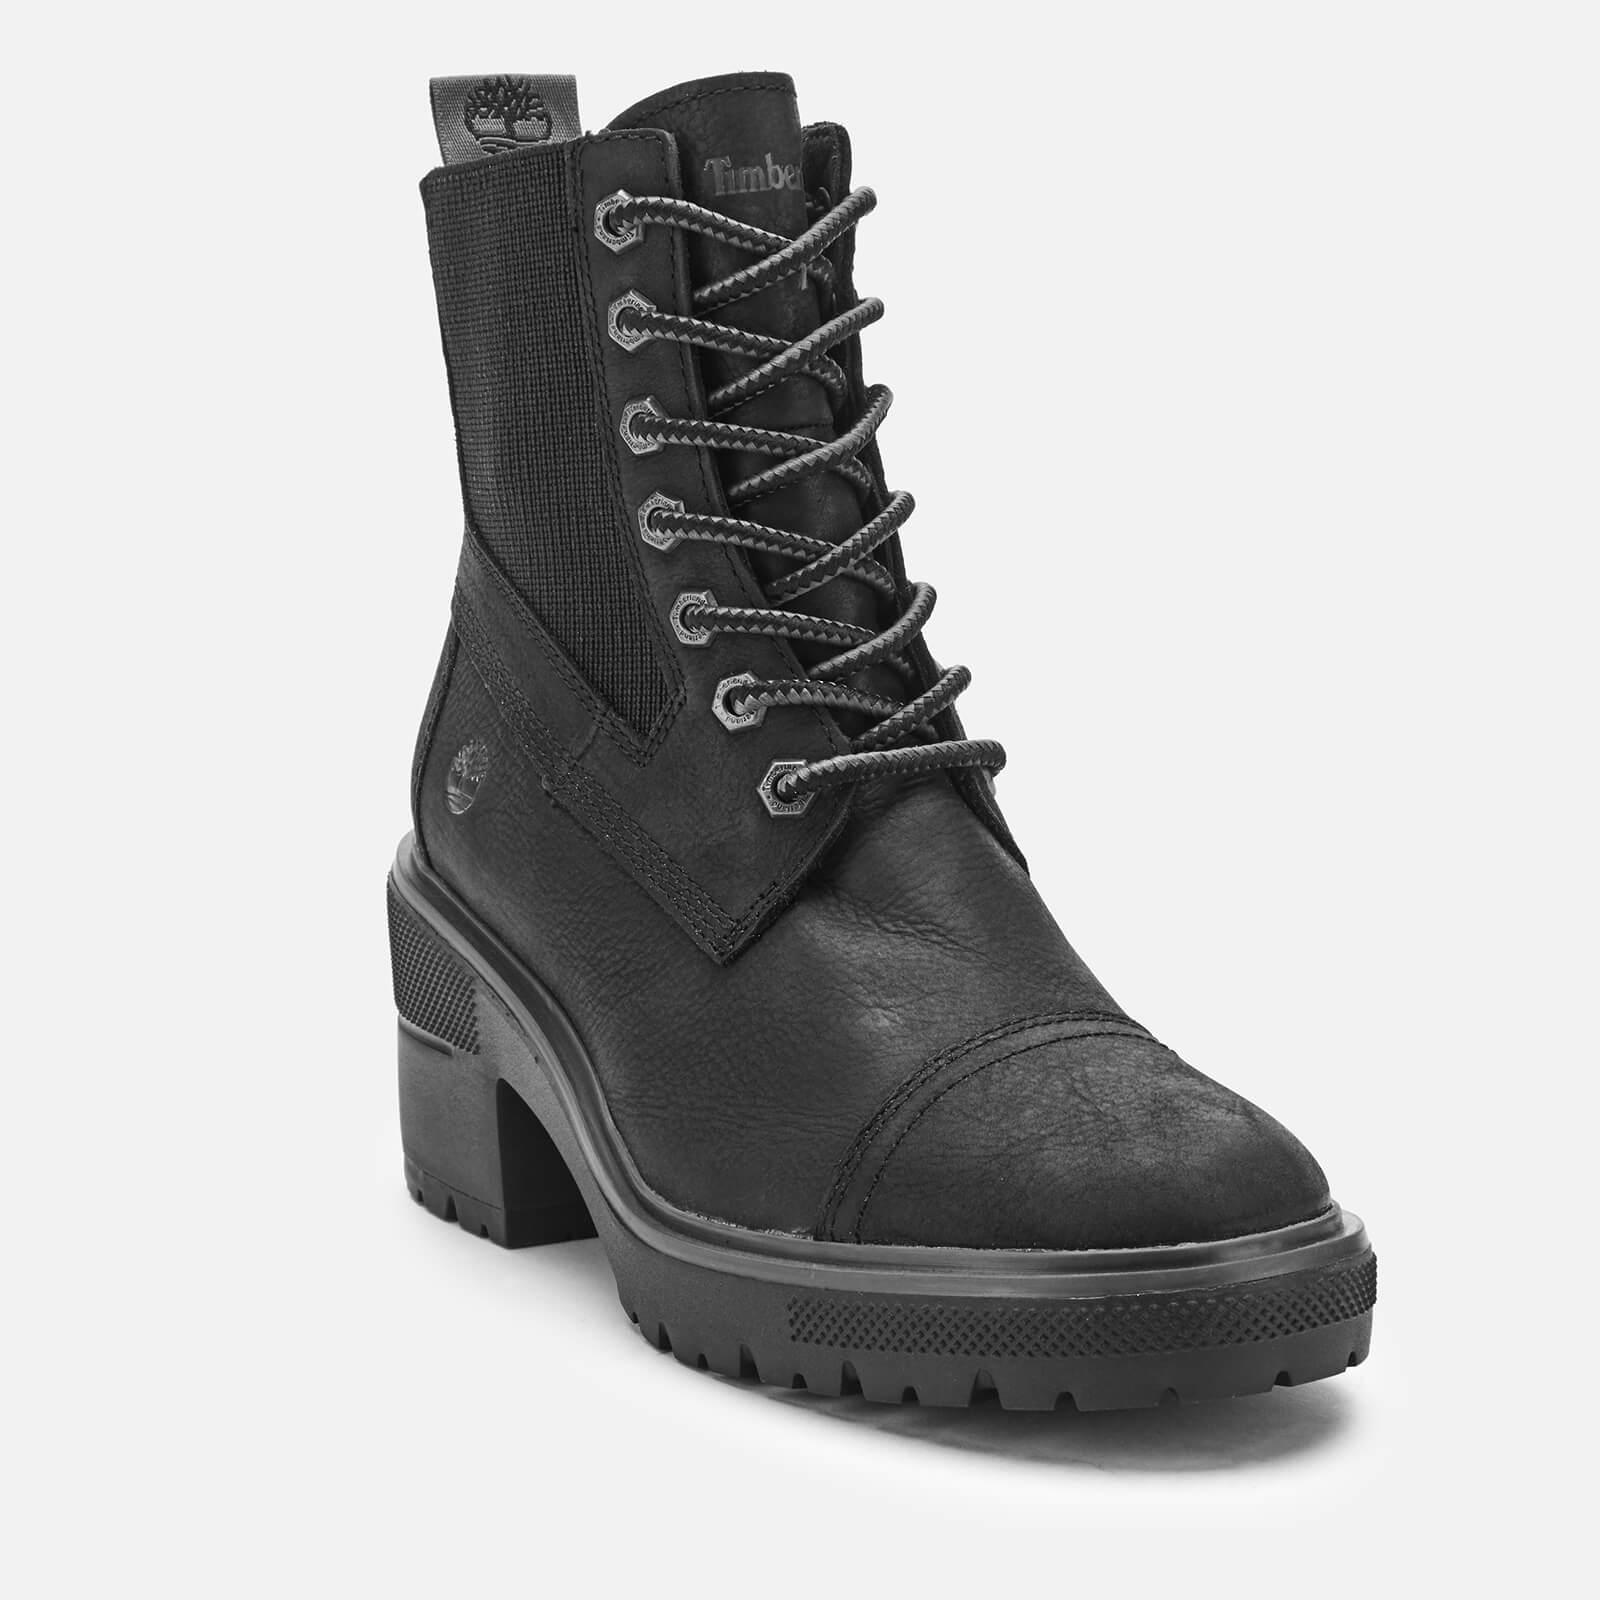 Timberland Women's Silver Blossom Mid Boots - Black Full Grain